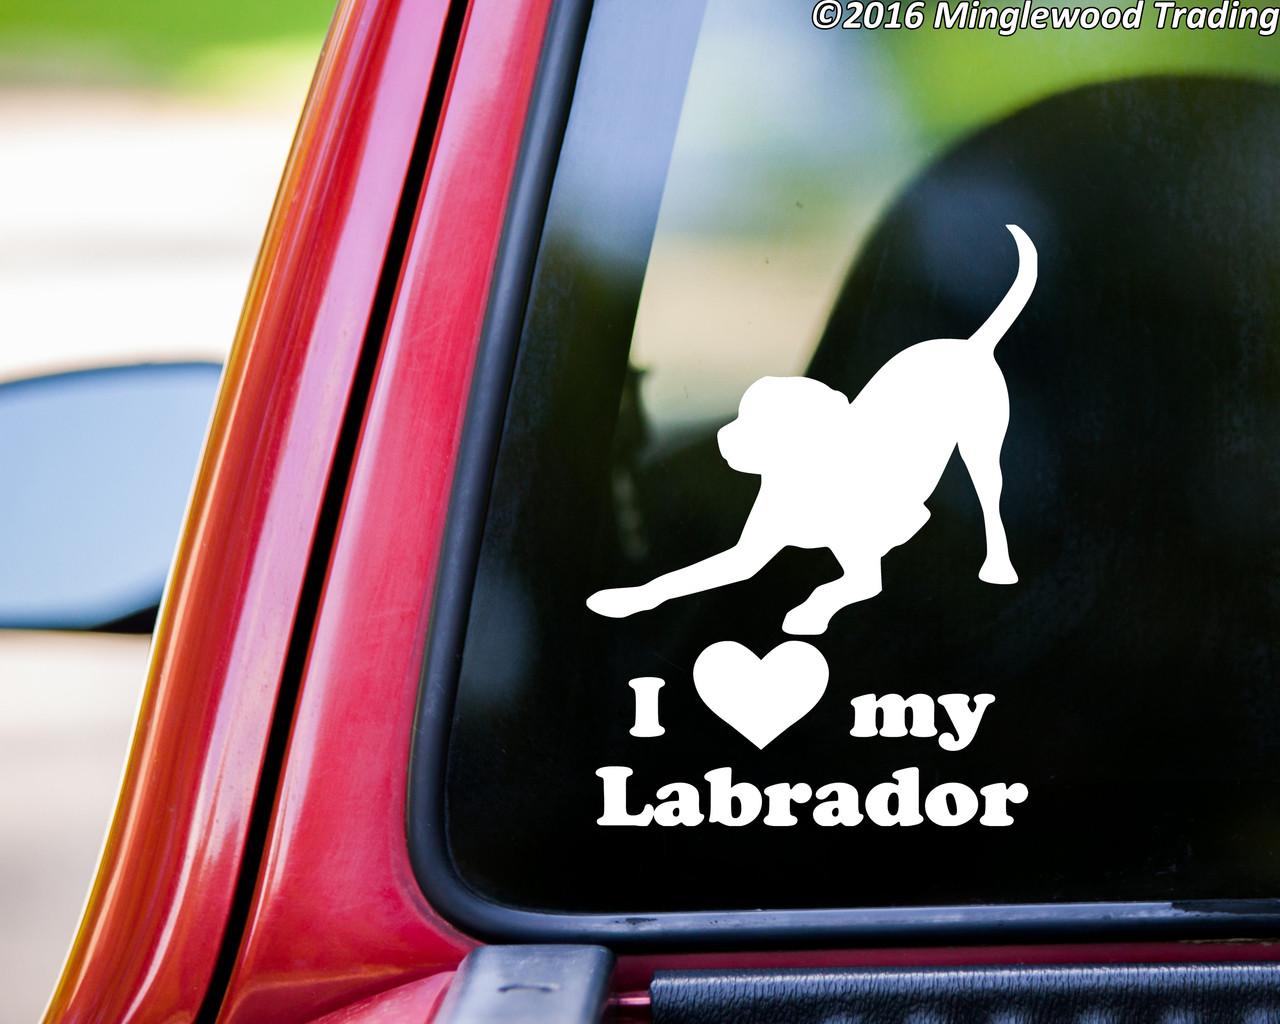 Labrador Mom Heart Paw Decal Lab Dog Dog Lover Gift Dog Decal Window Sticker Dog Pet Lover Labrador Dog Dog Decals Lab Dogs